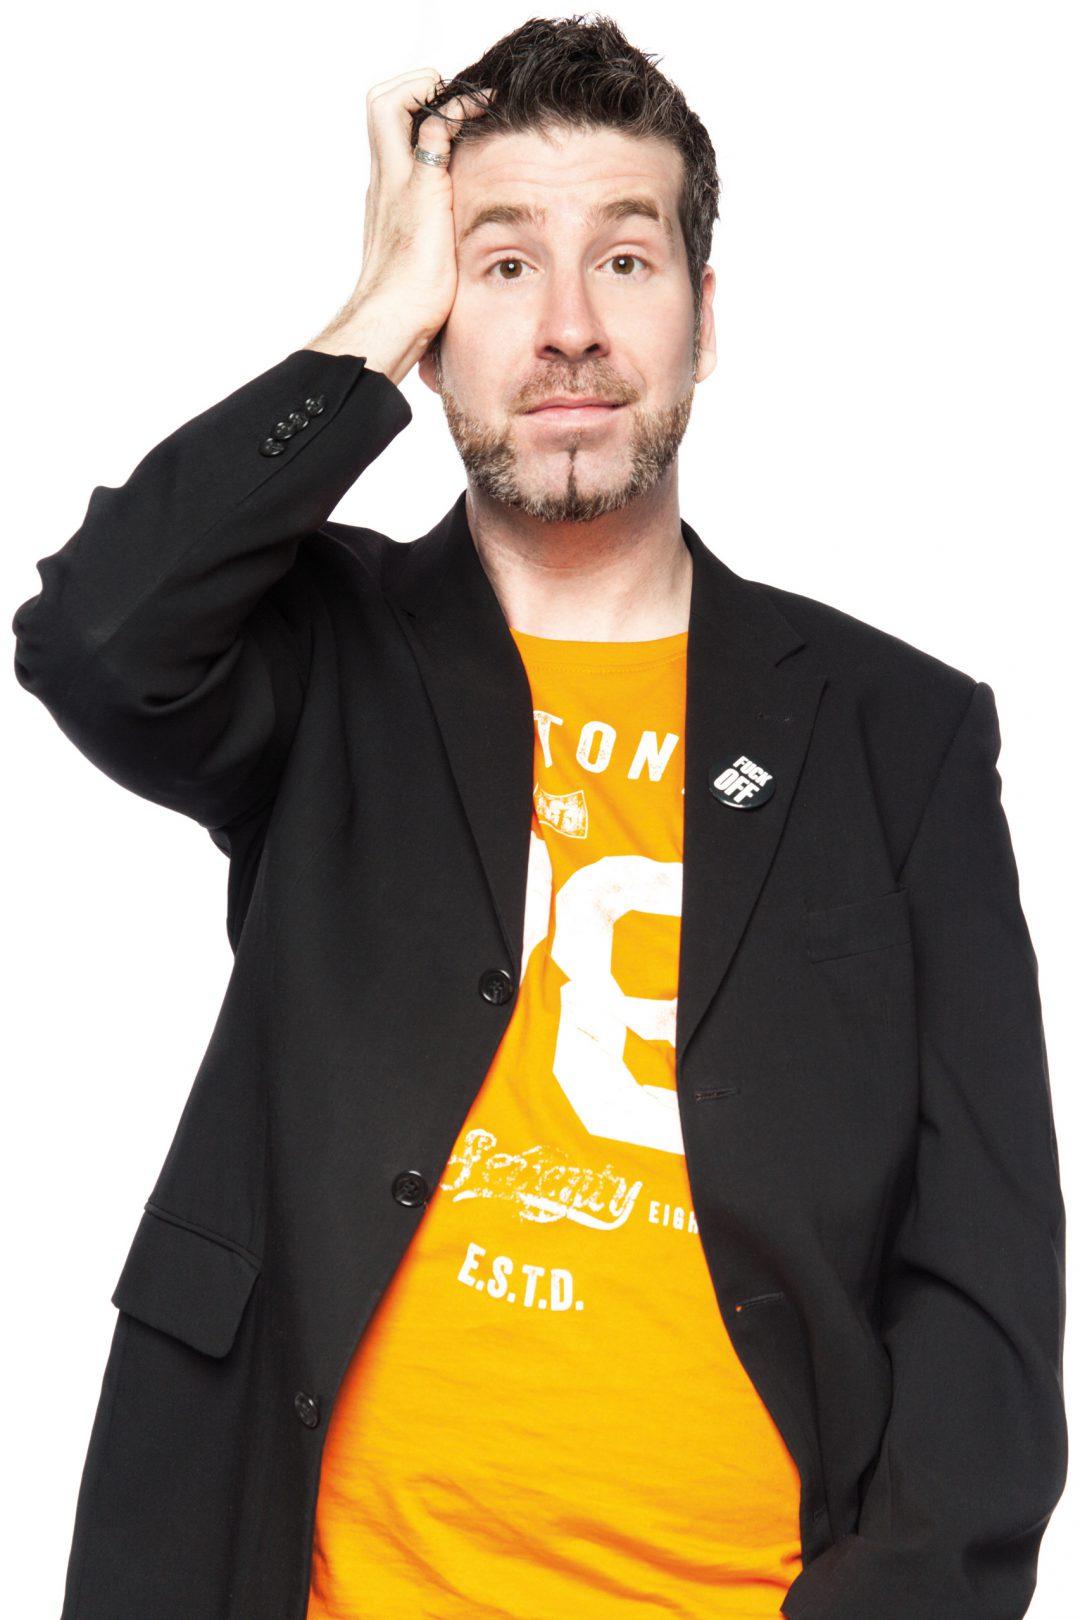 Torsten Schlosser